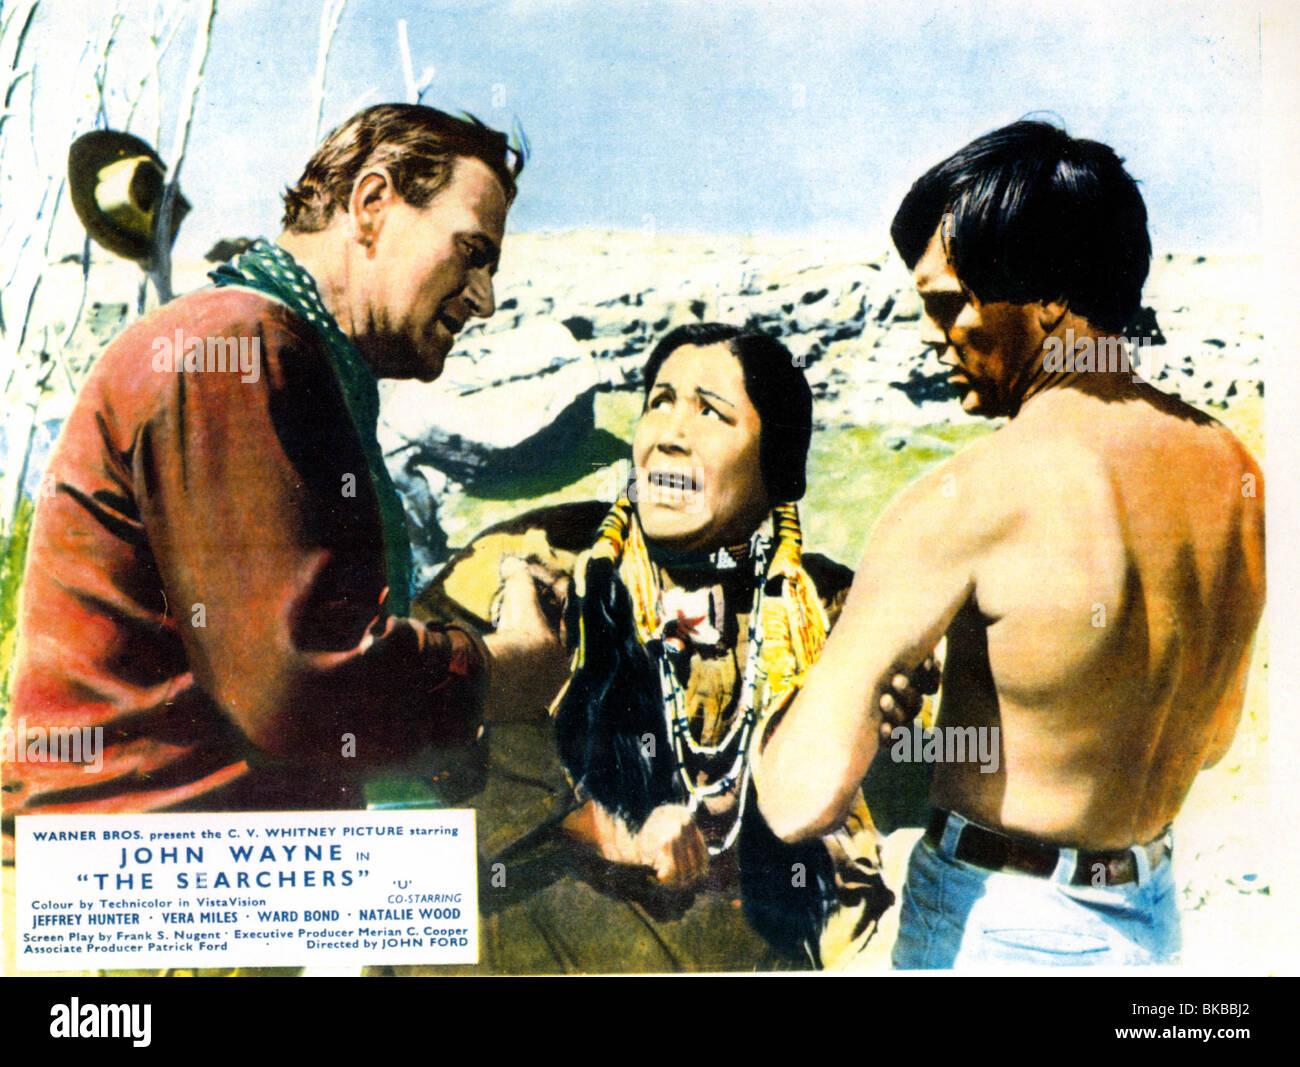 THE SEARCHERS (1956) JOHN WAYNE SEA 002CP - Stock Image